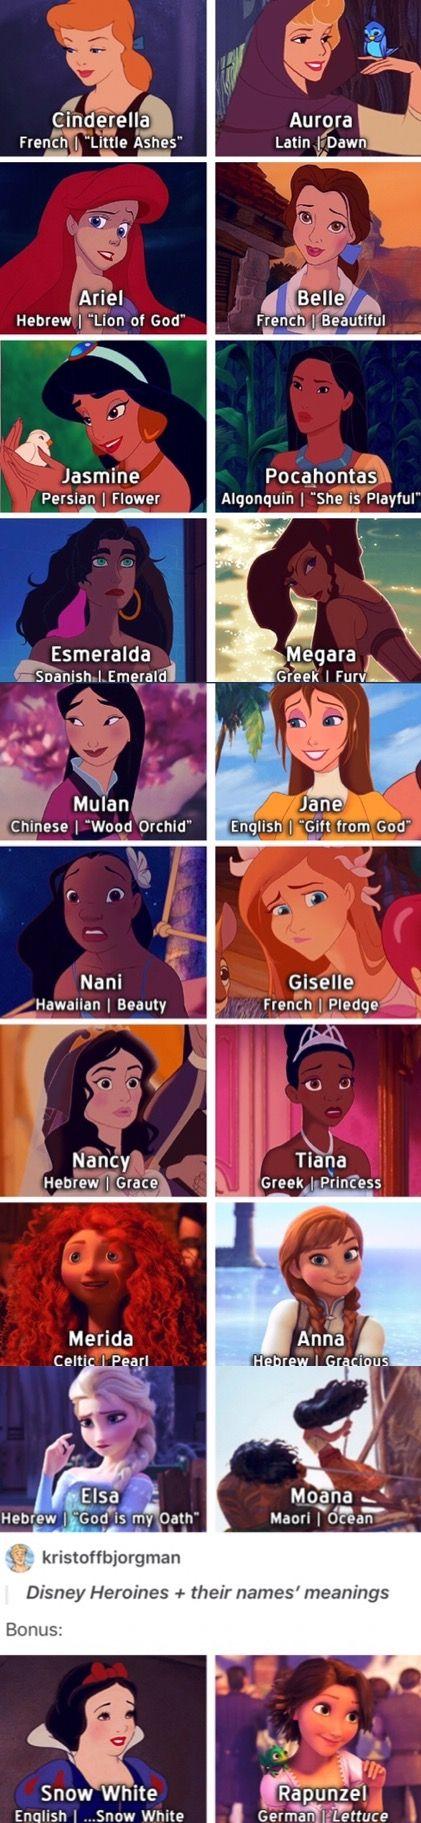 Disney Heroines + meaning of their names